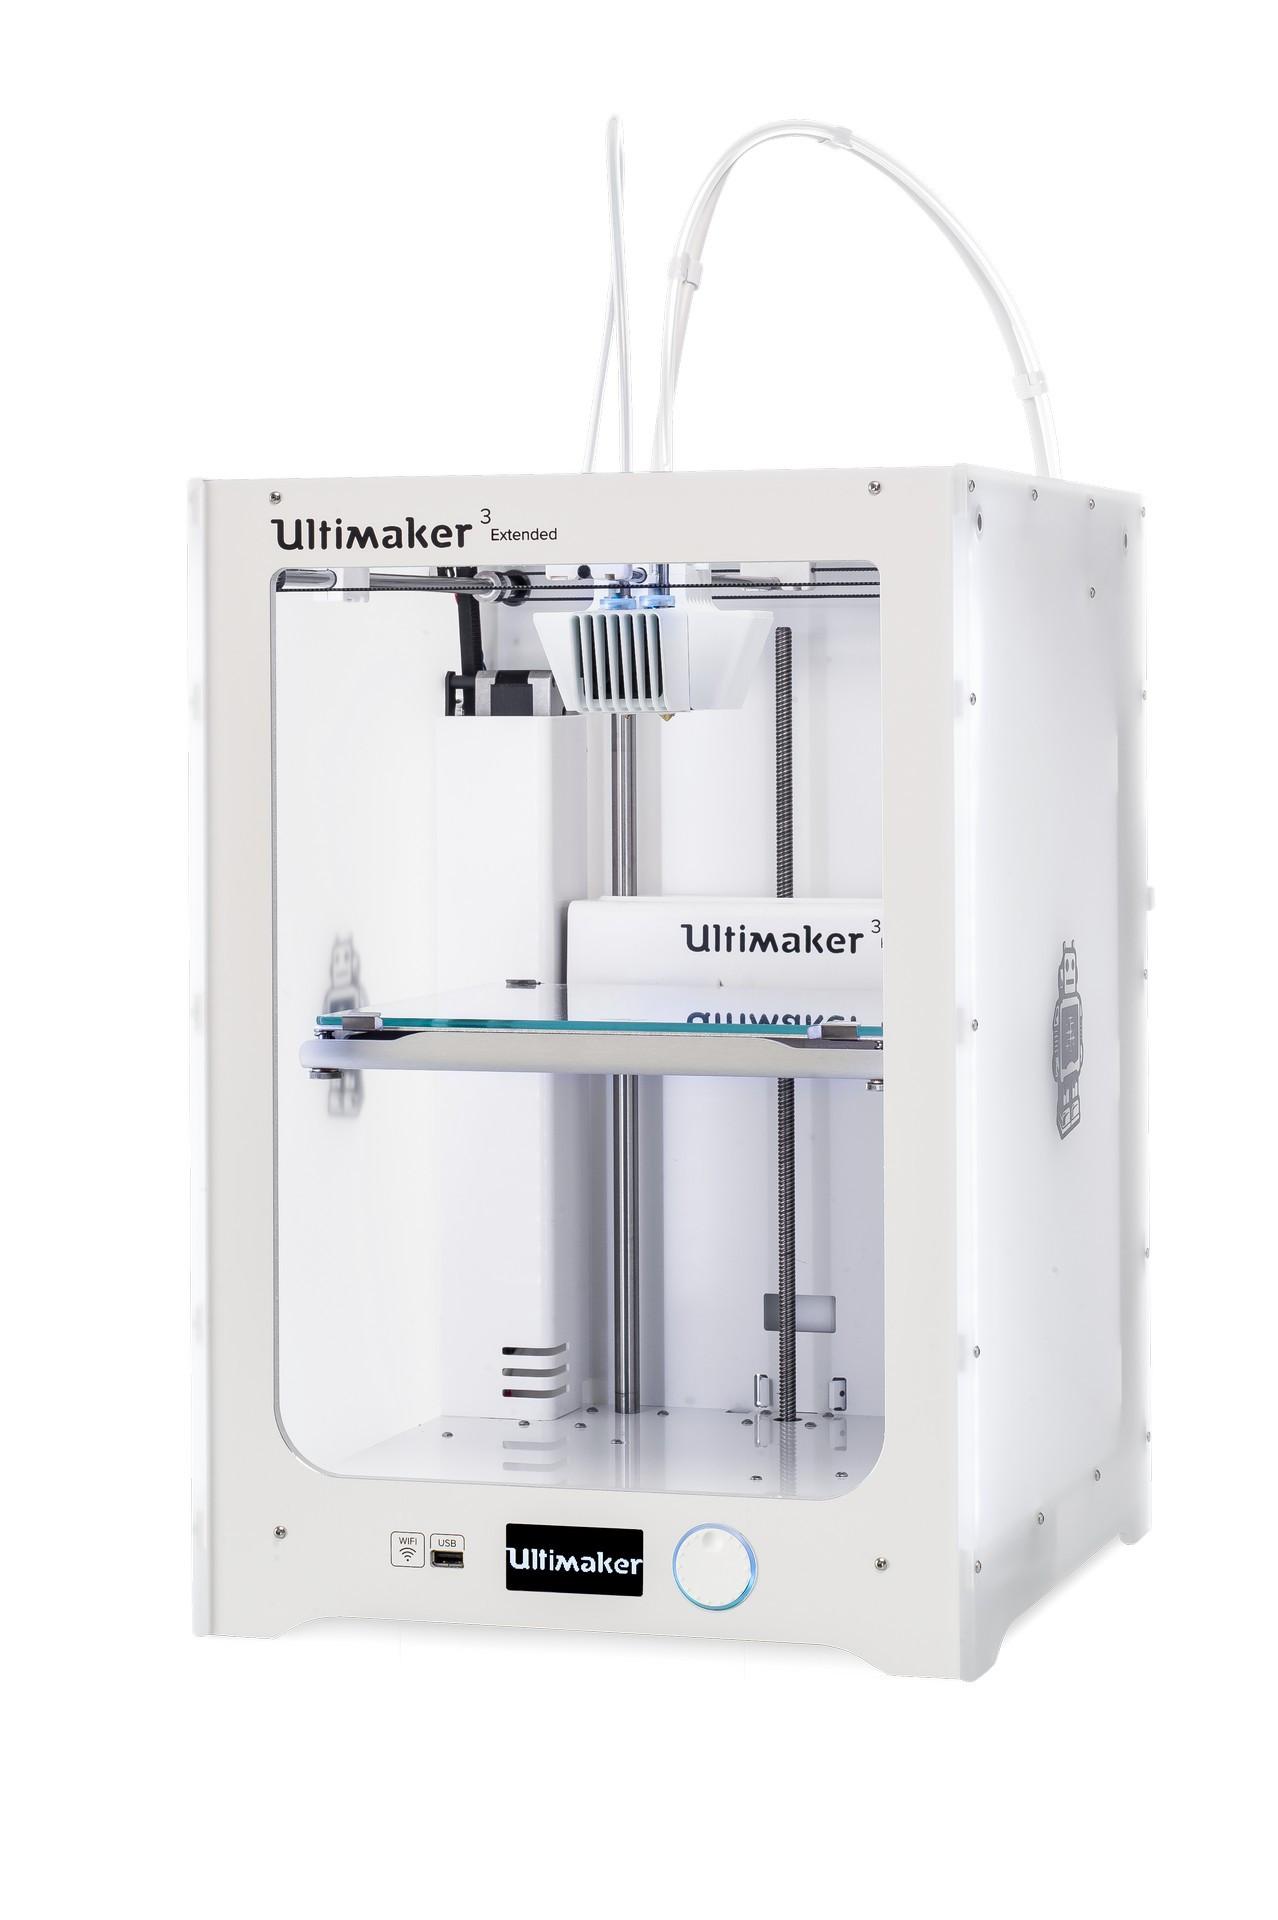 3D Printing (FDM)